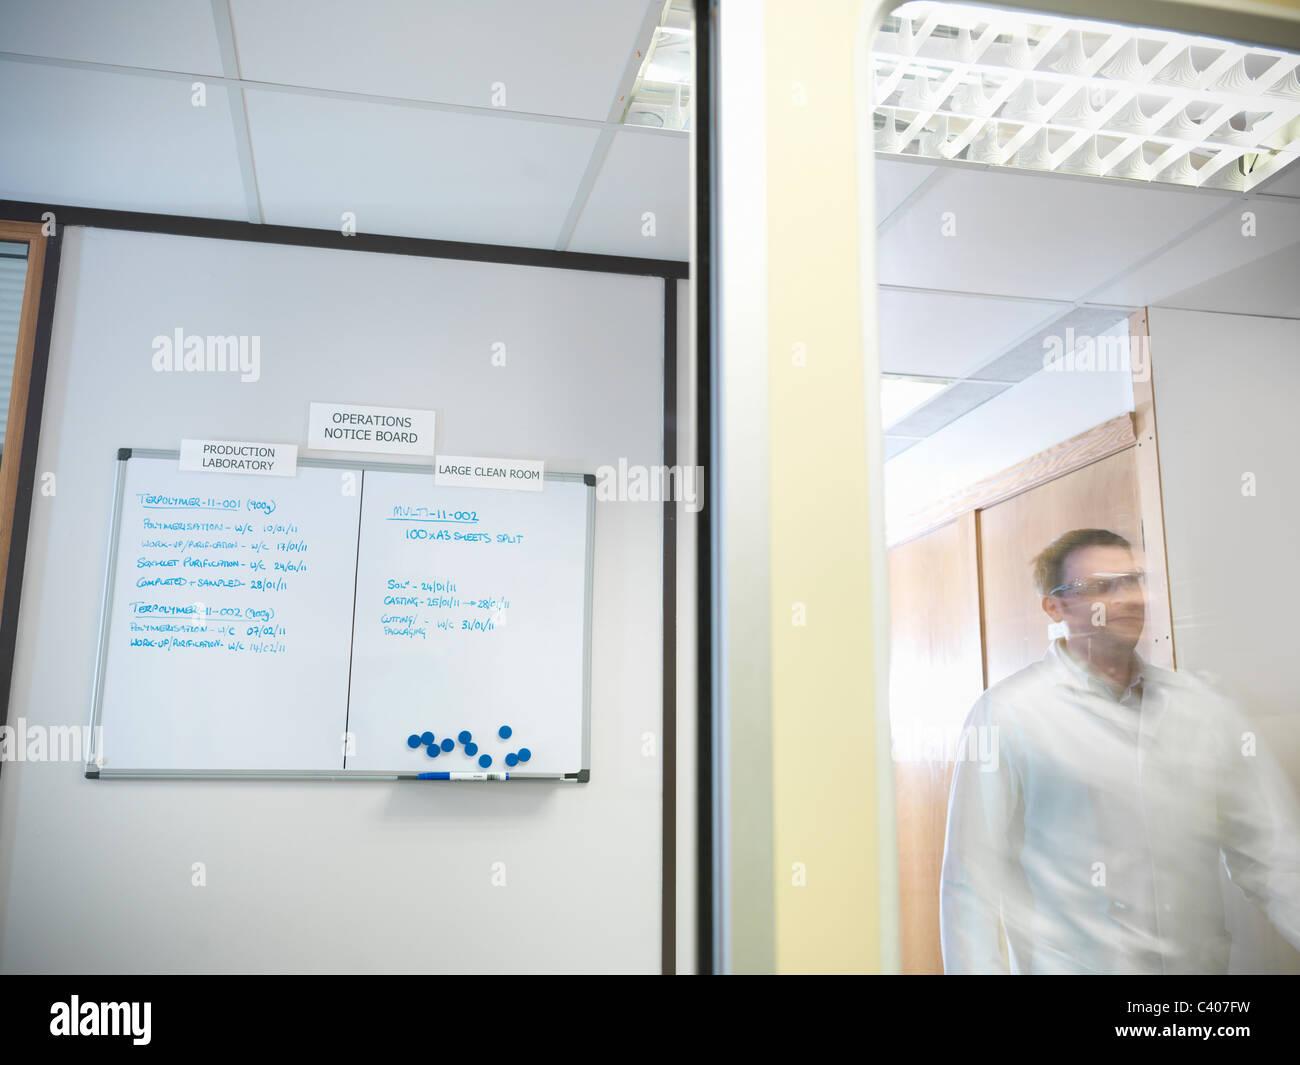 Scientist next to noticeboard - Stock Image